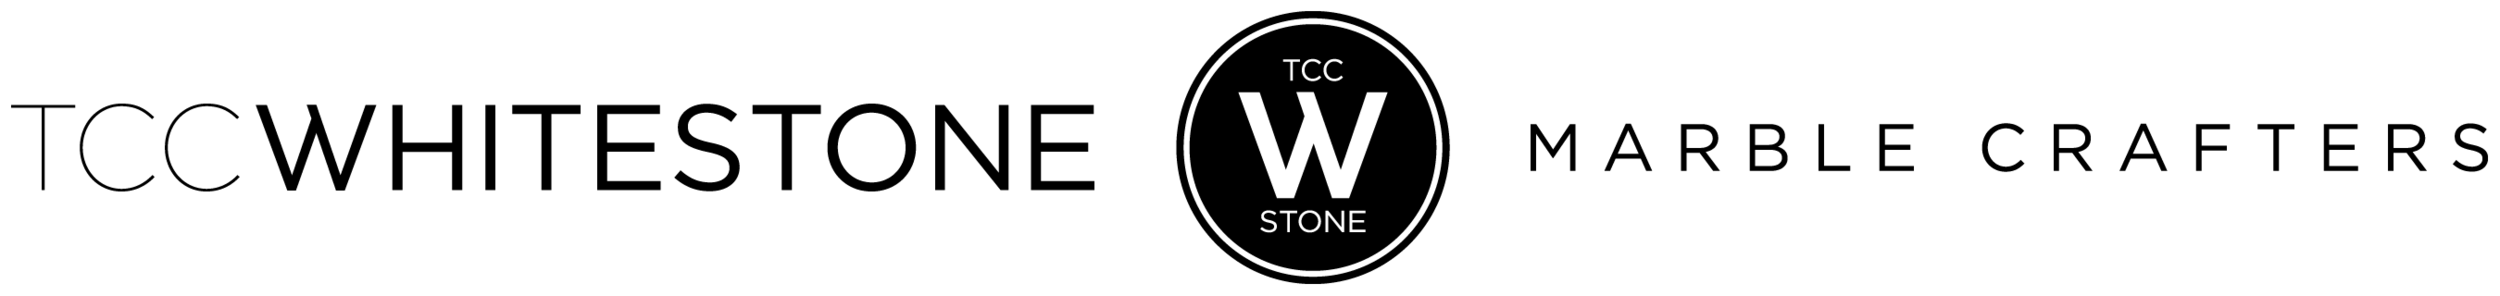 logo_tcc.png